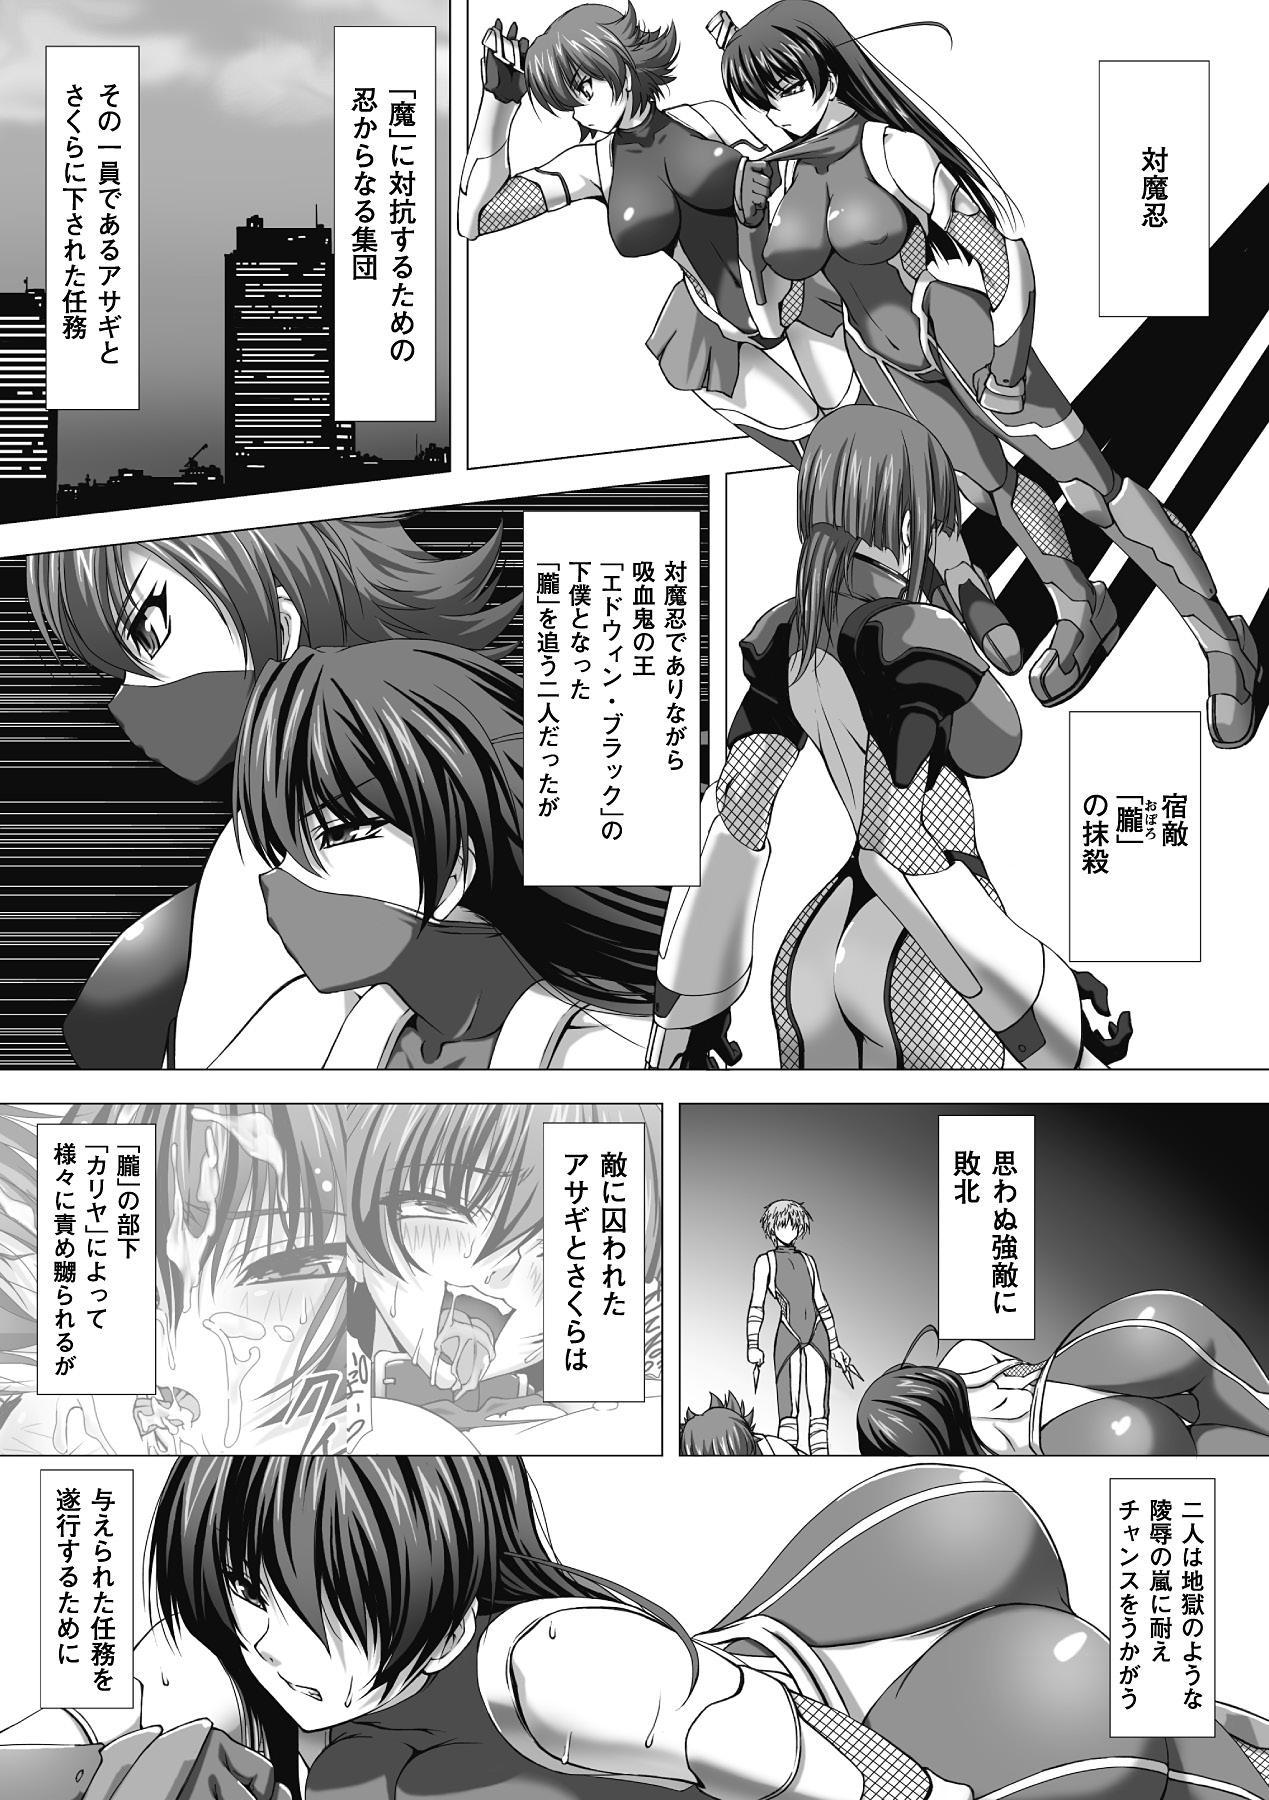 Megami Crisis 1 3